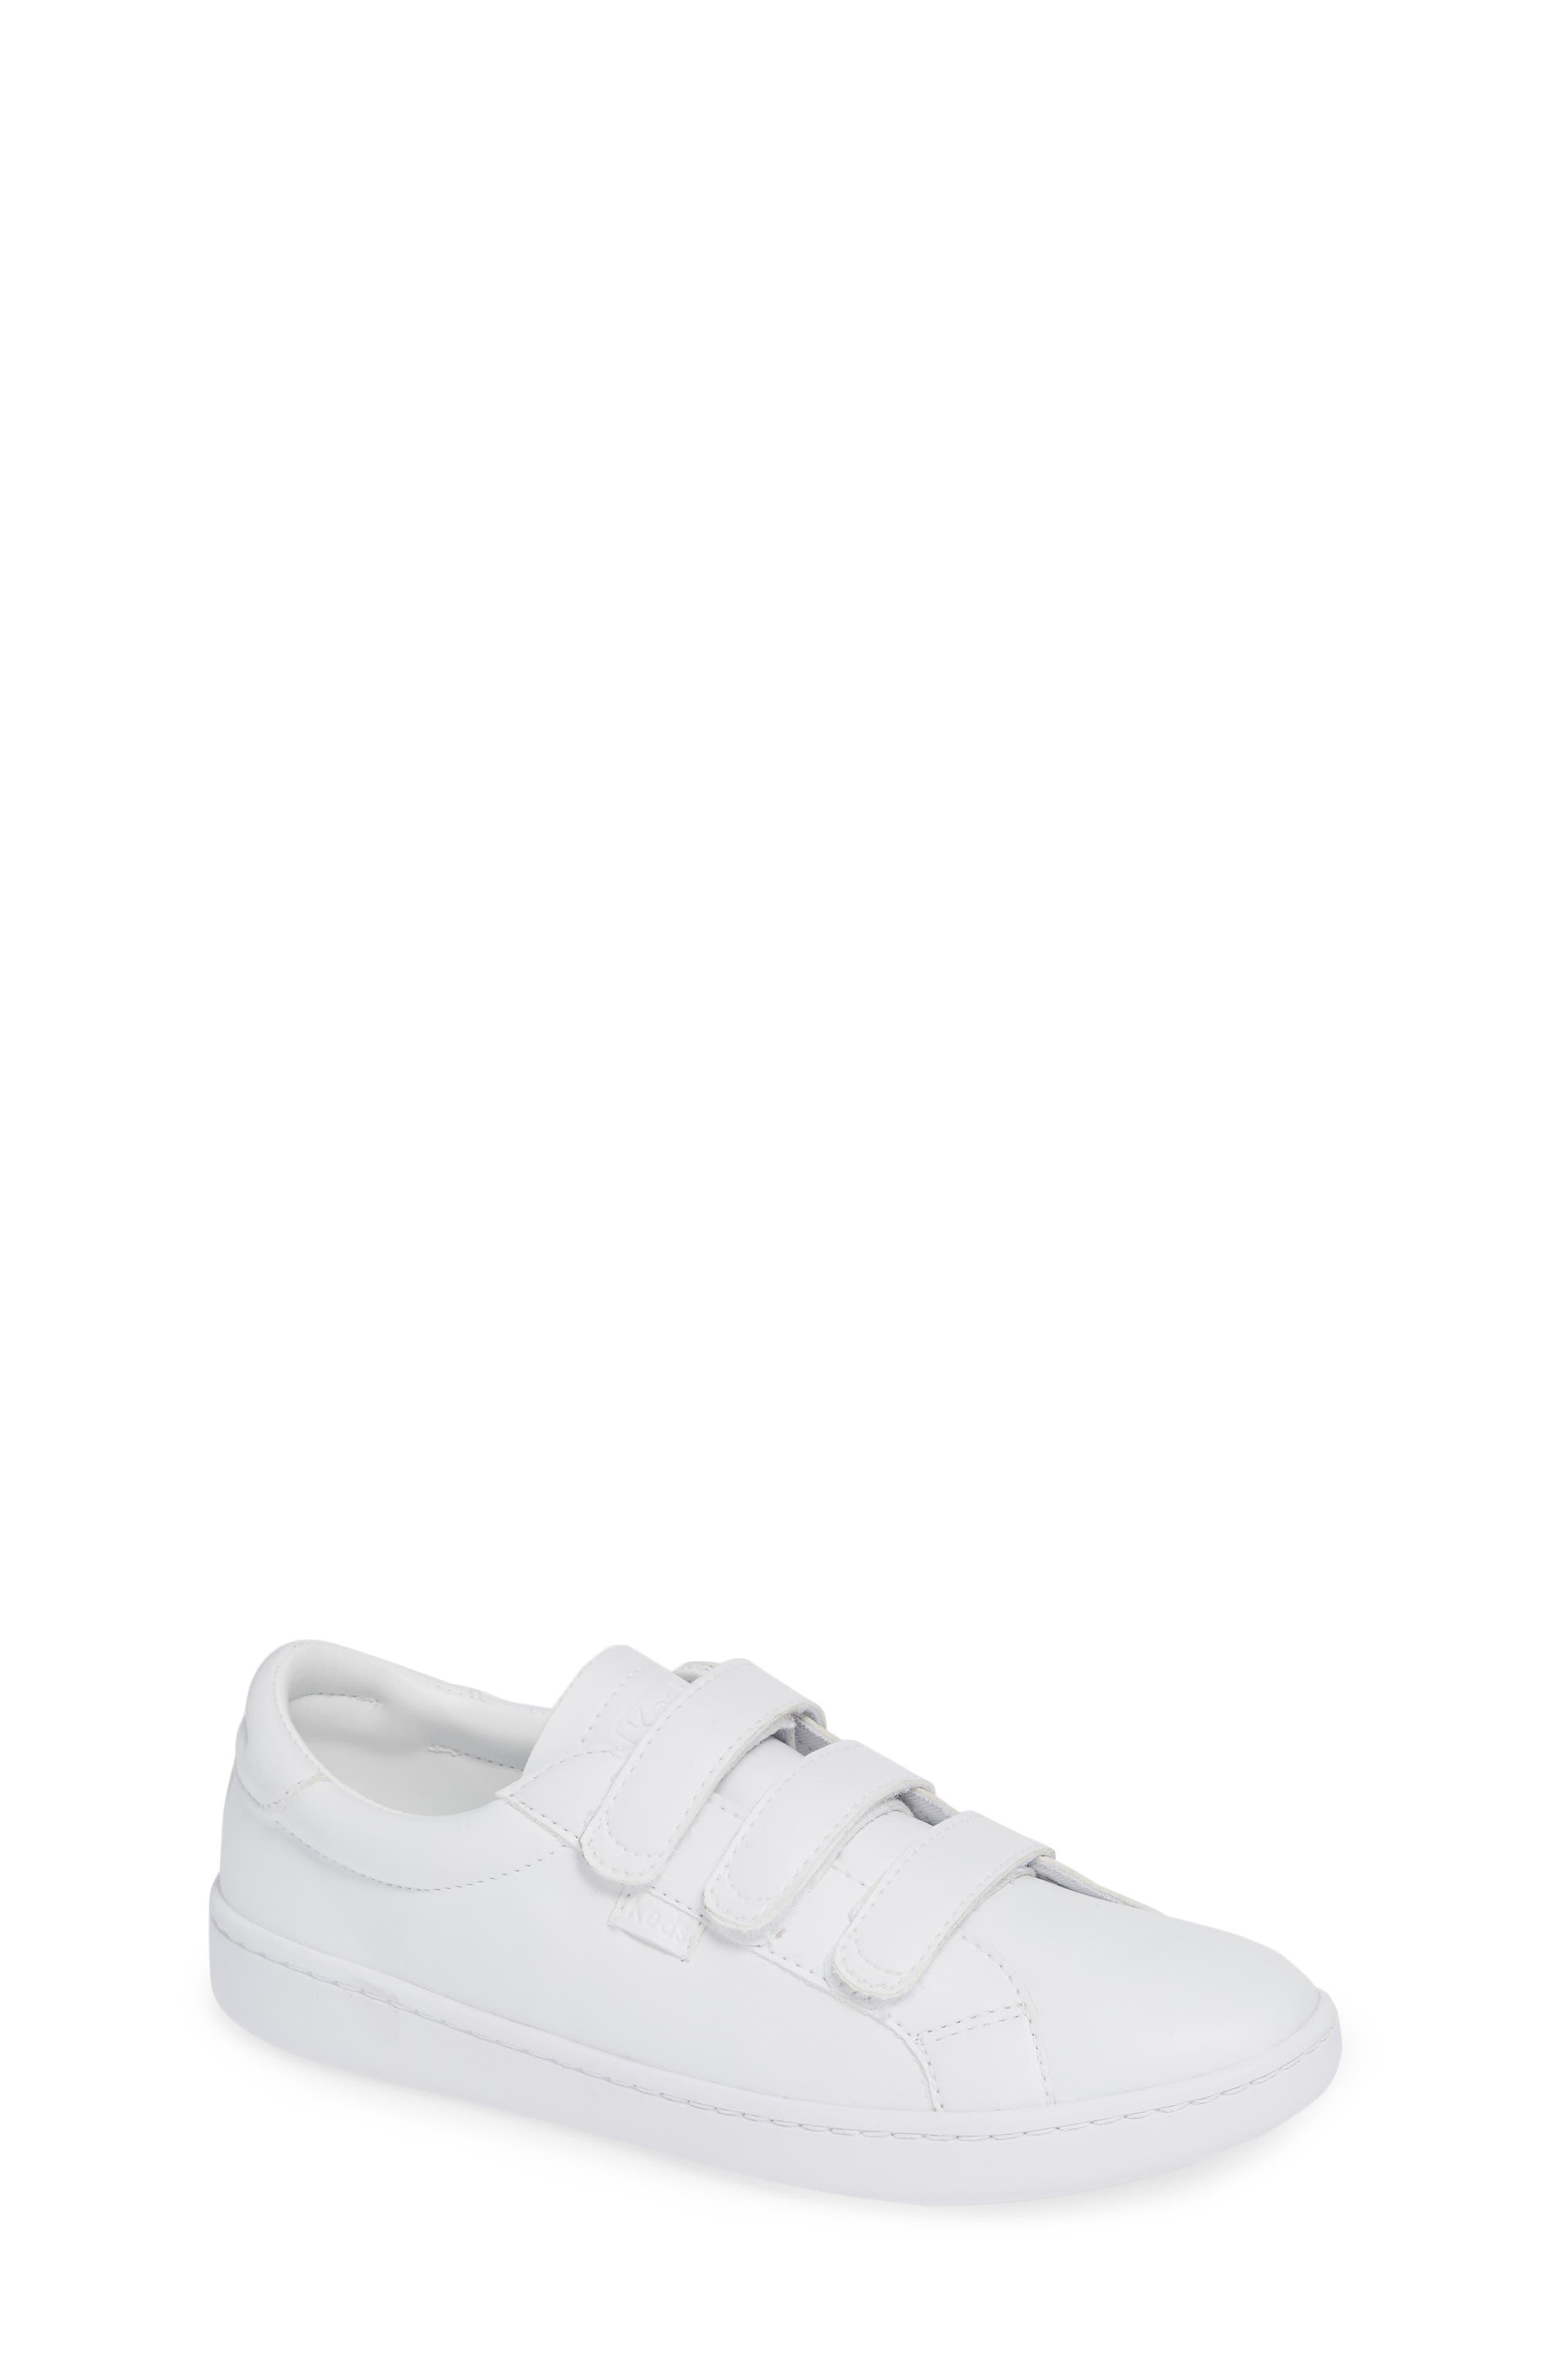 KEDS<SUP>®</SUP>, Ace 3V Sneaker, Main thumbnail 1, color, 100